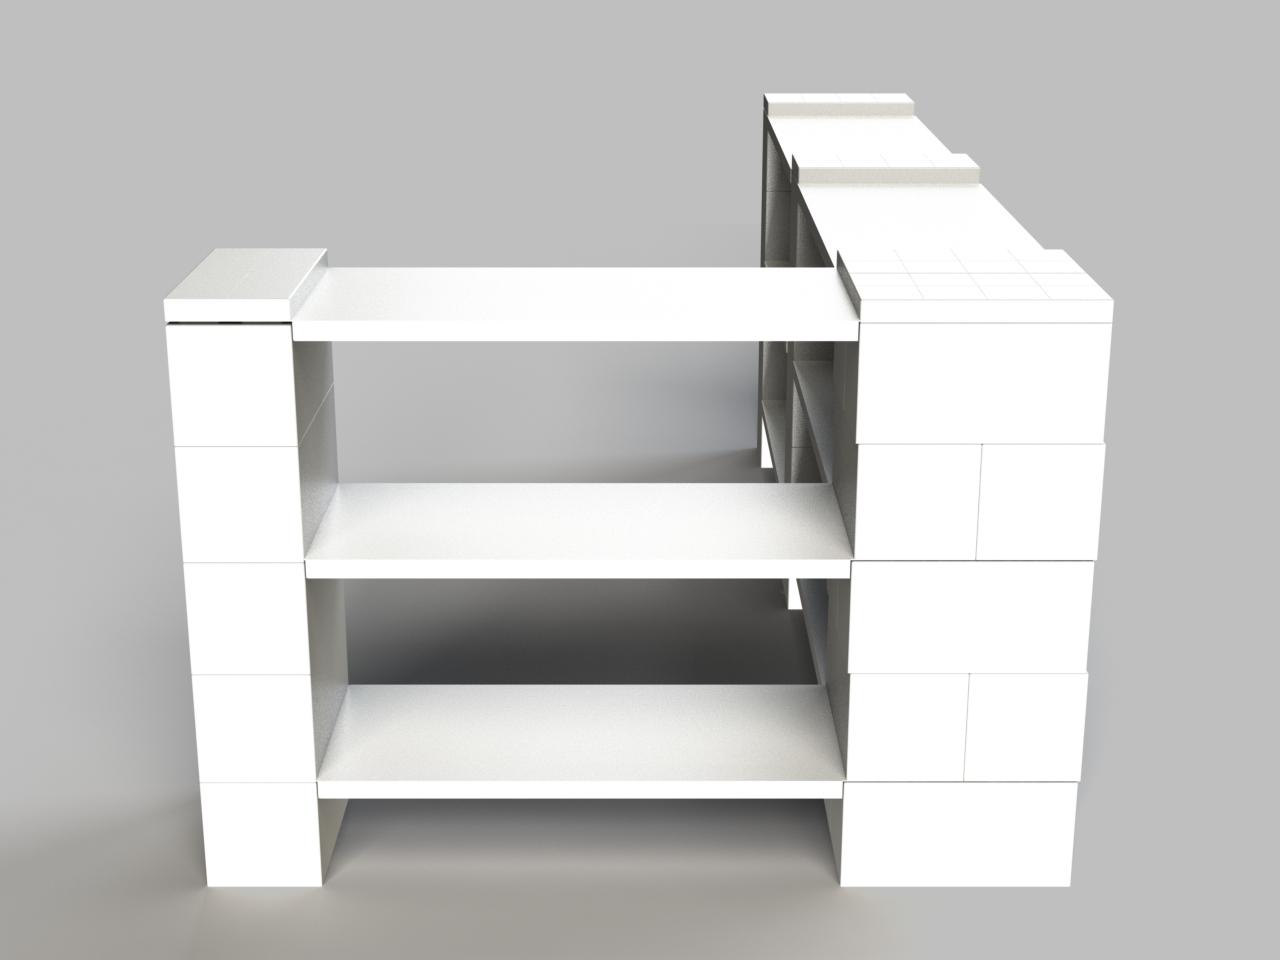 3 Level Double Corner Shelving Kit B Everblock Systems